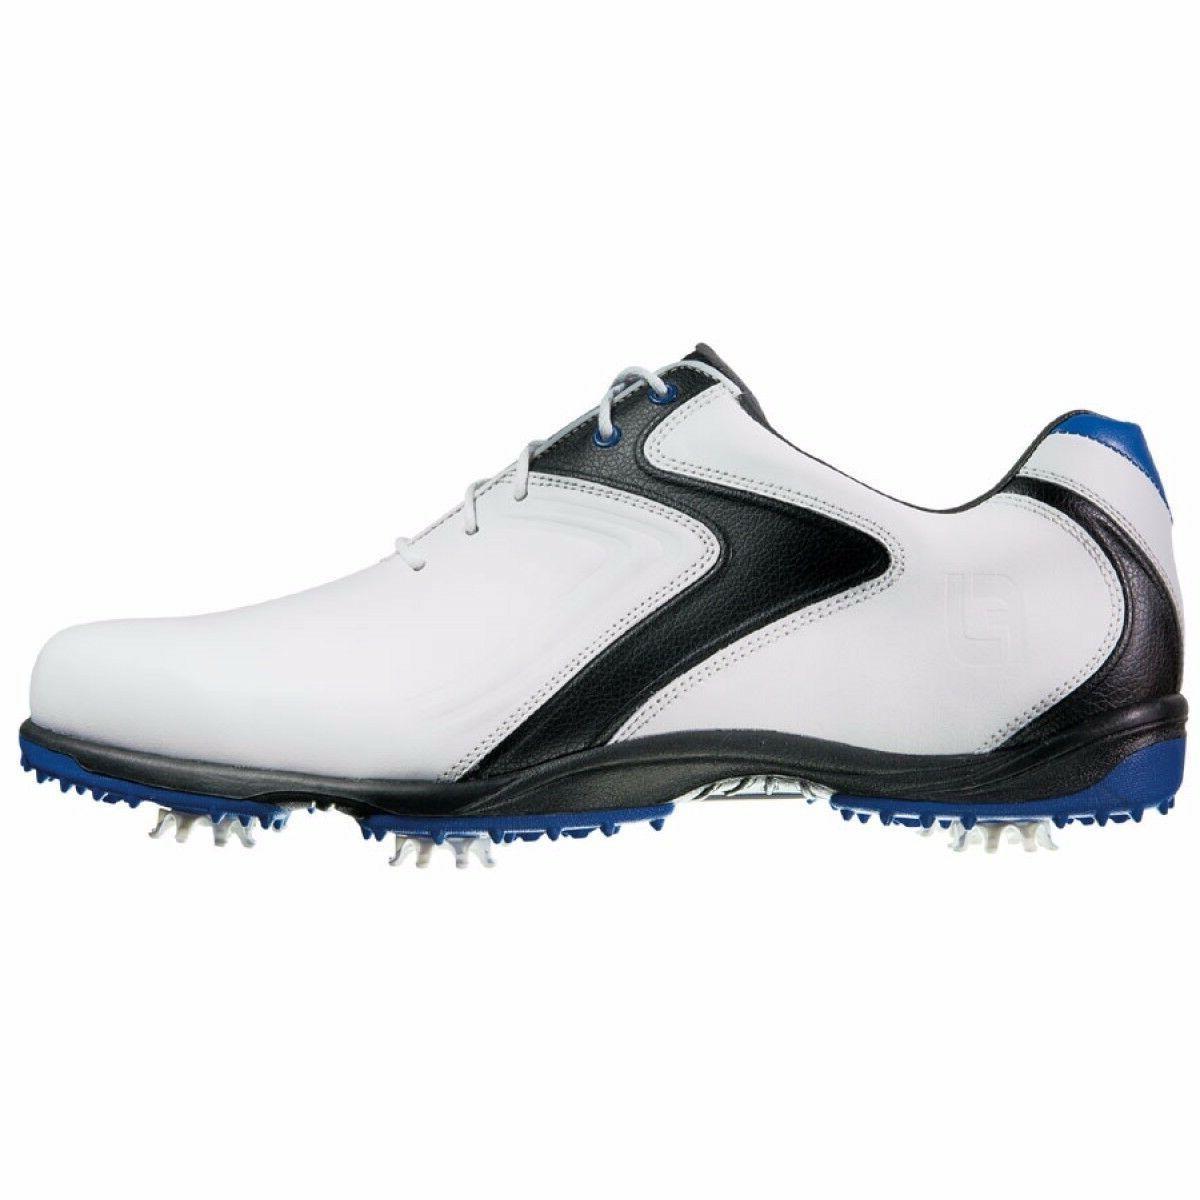 NEW FootJoy Mens Hydrolite Golf Shoes #50031 - Size 8.5 $115